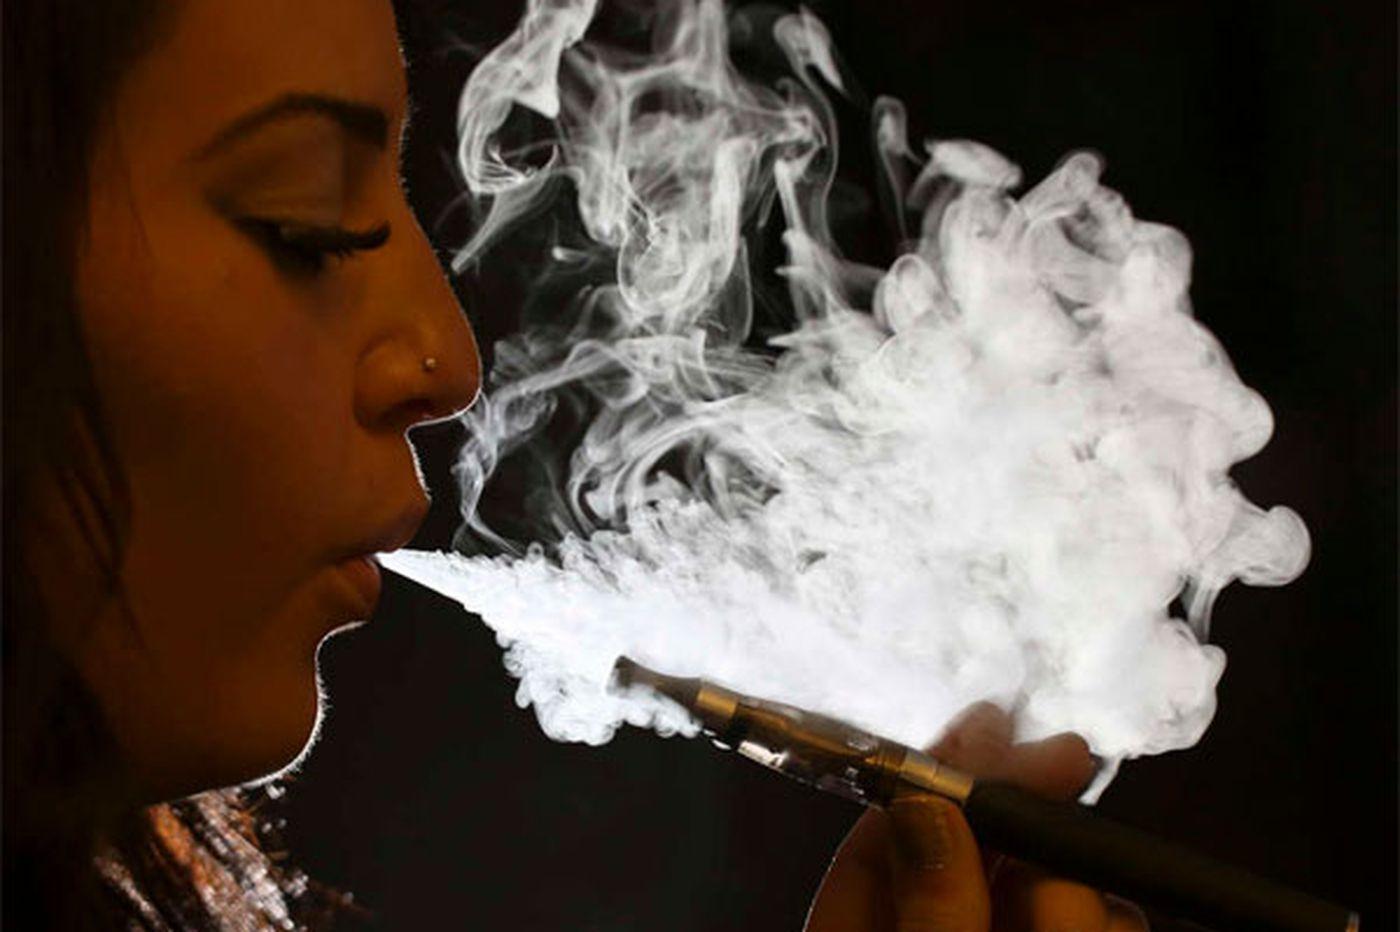 FDA set to decide whether to regulate e-cigarettes